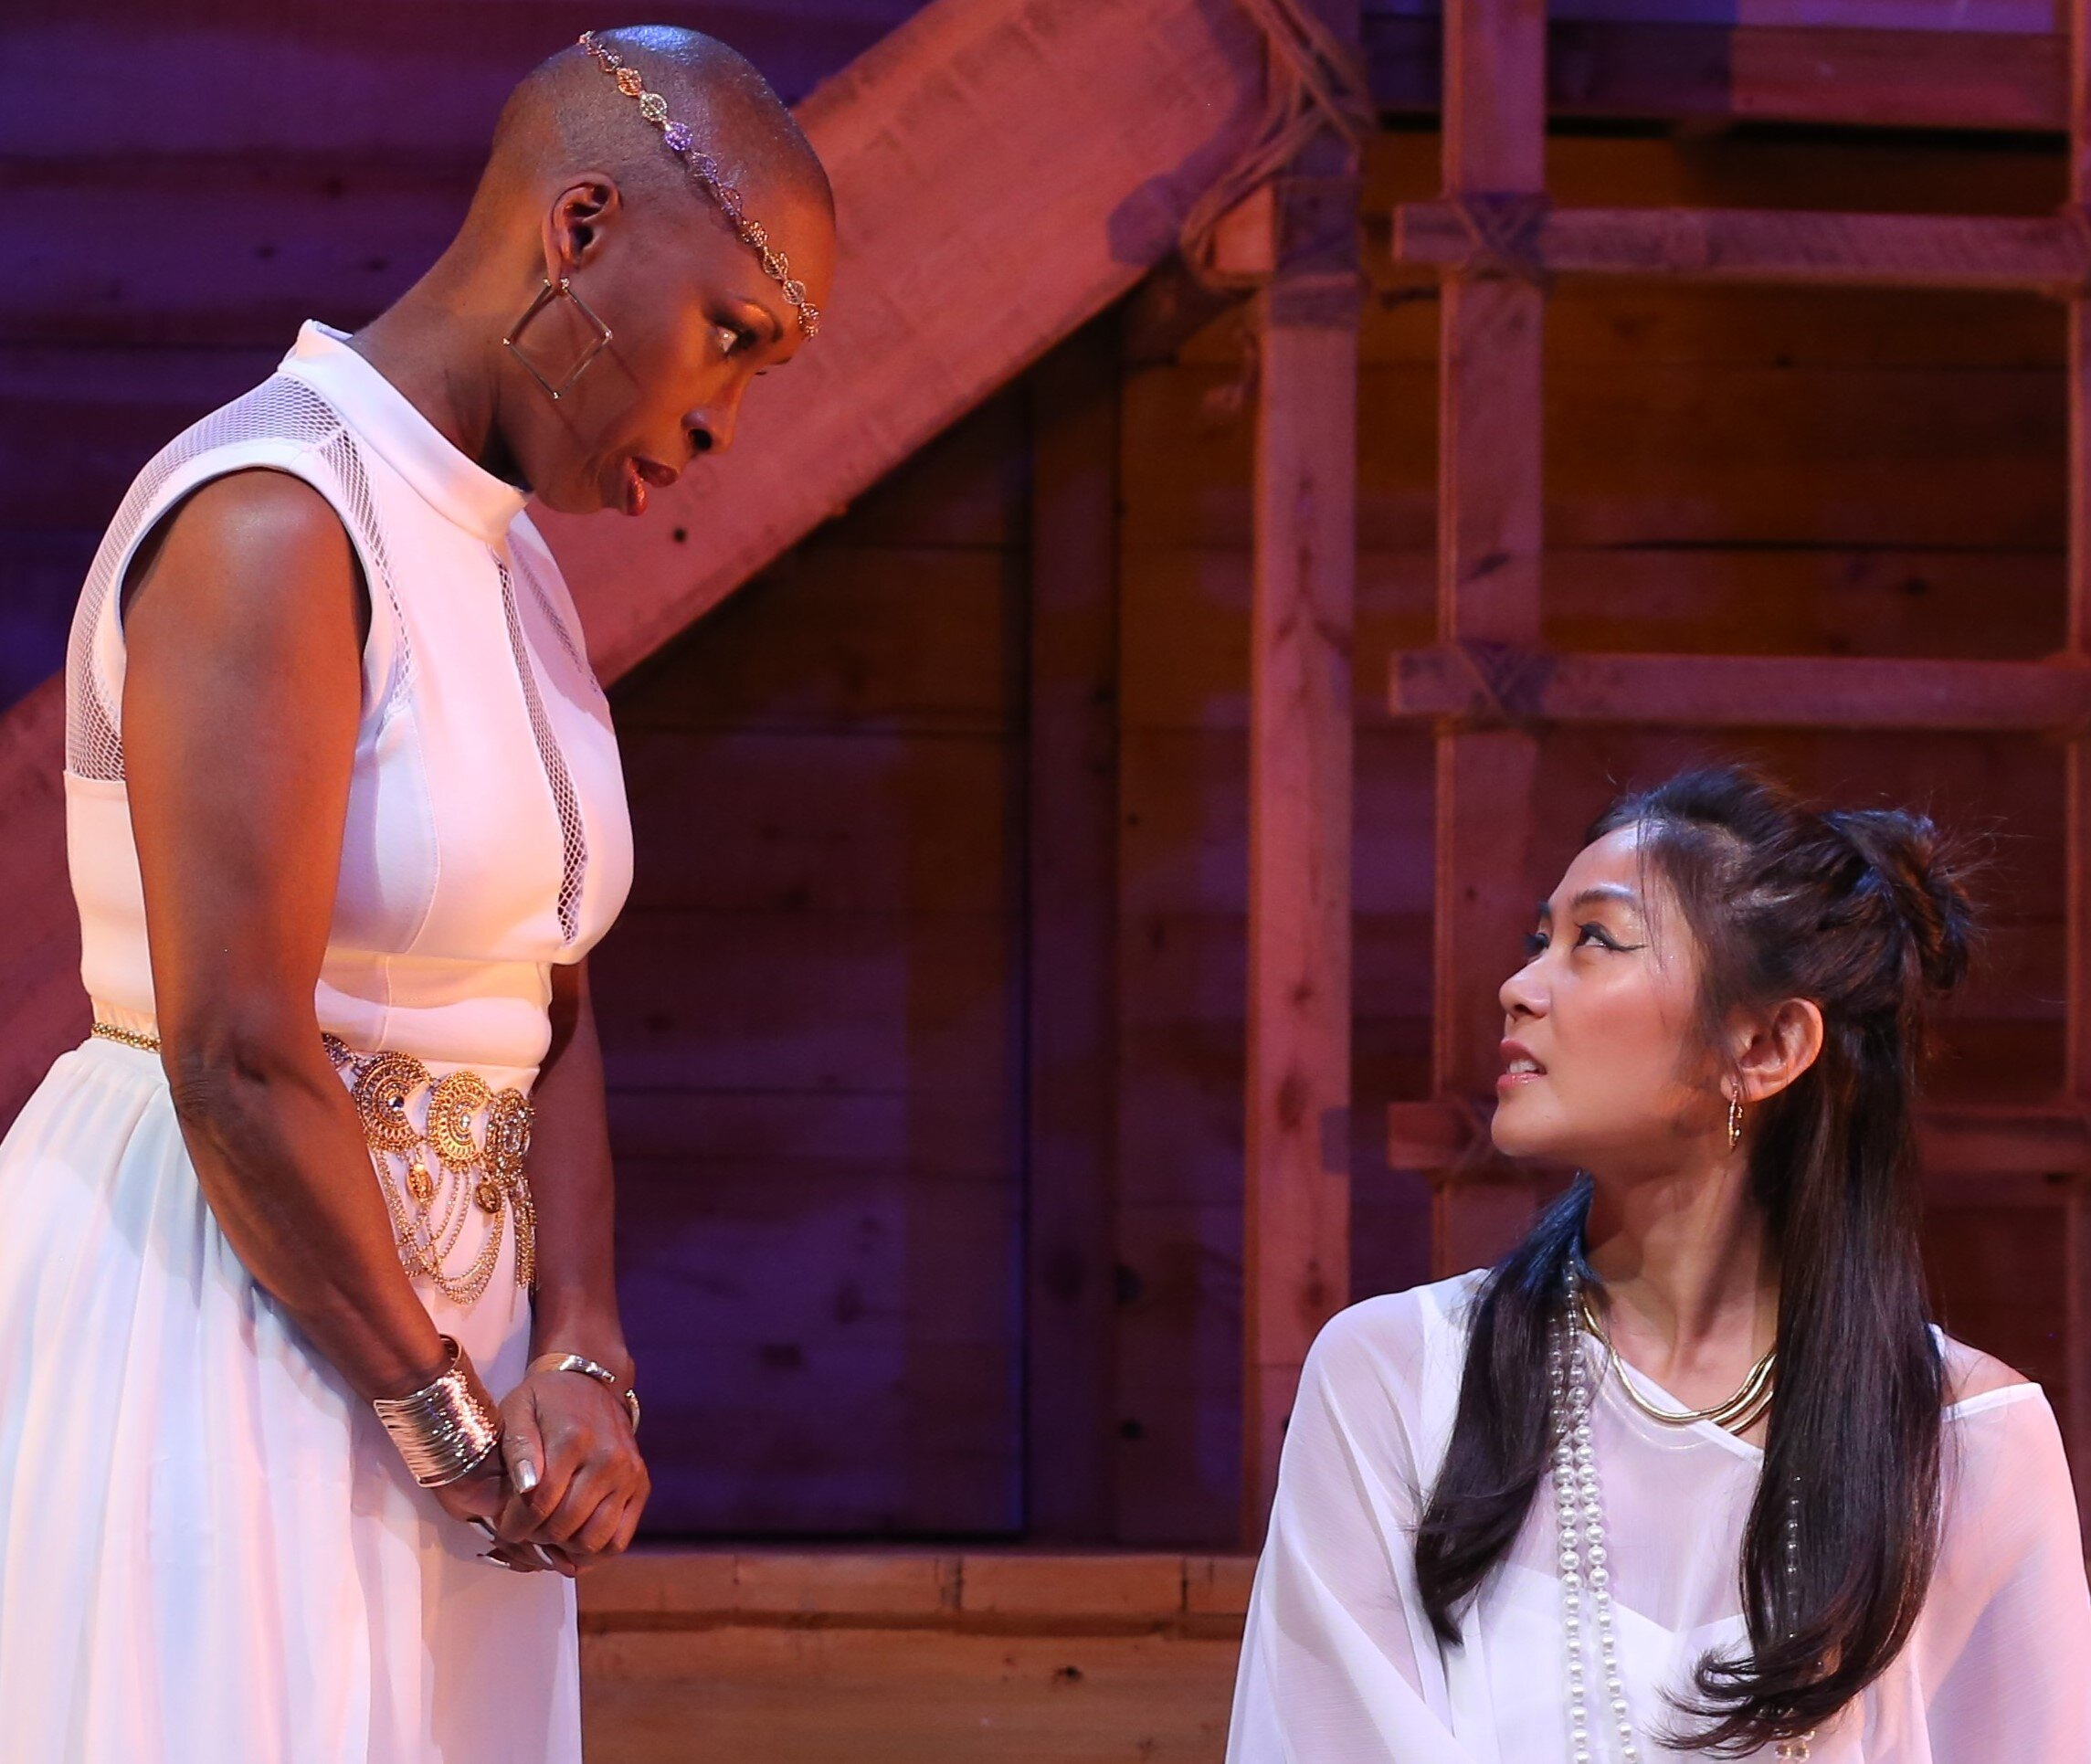 Cleopatra struggles with the domination of her chief nurse, Ftatateeta (Brenda Braxton).